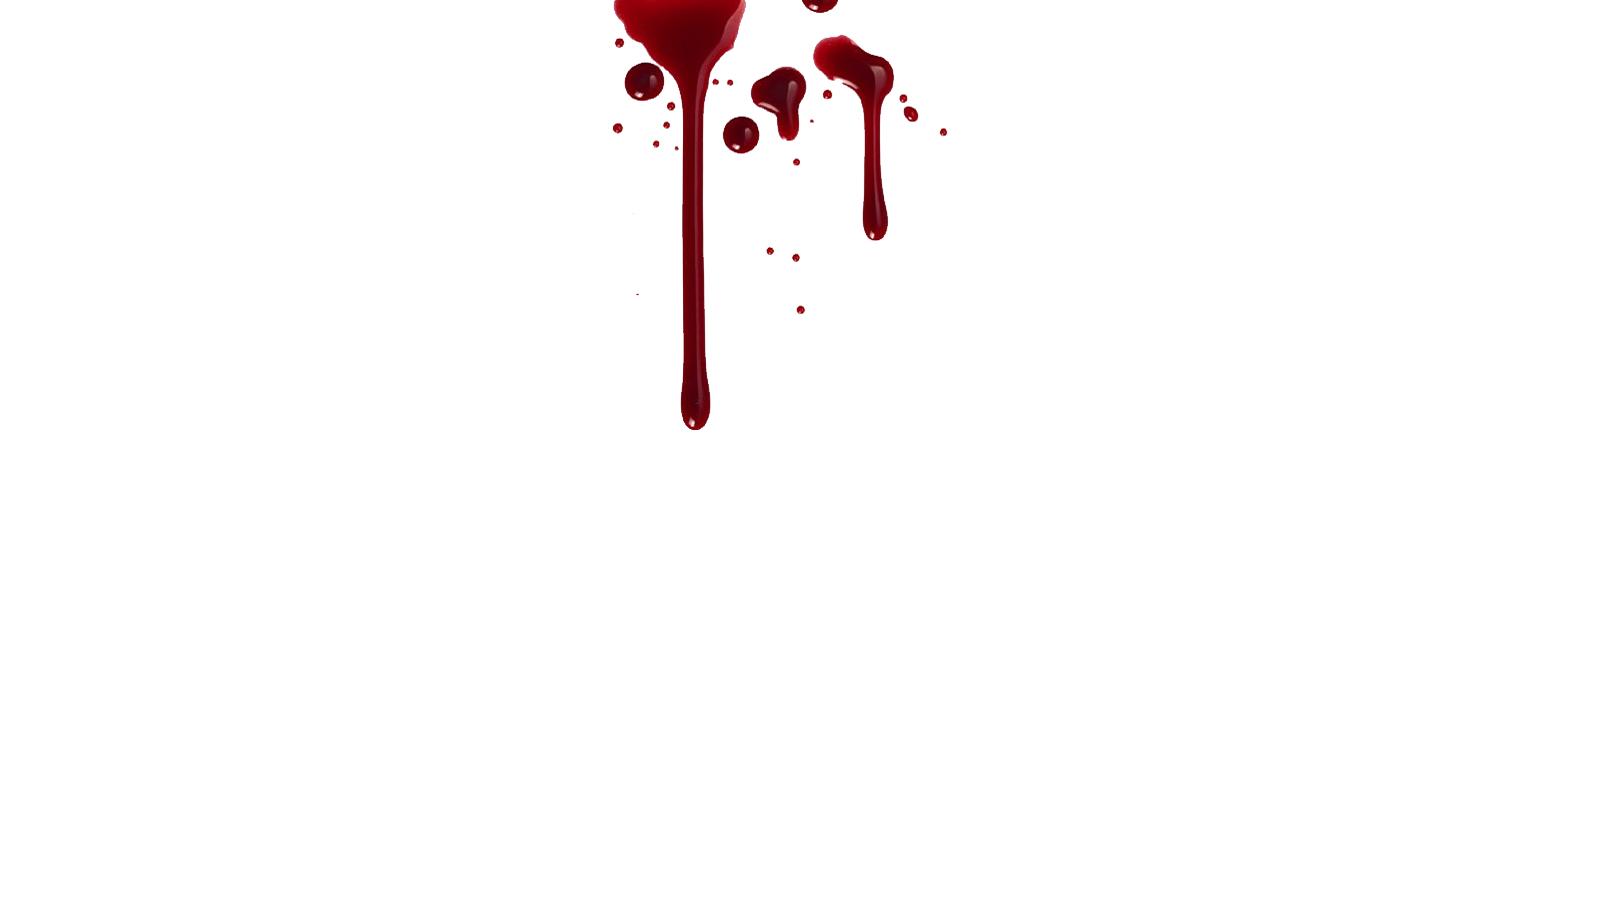 Desktop Wallpaper: Blood Splatter HD Wallpaper Stock Photo